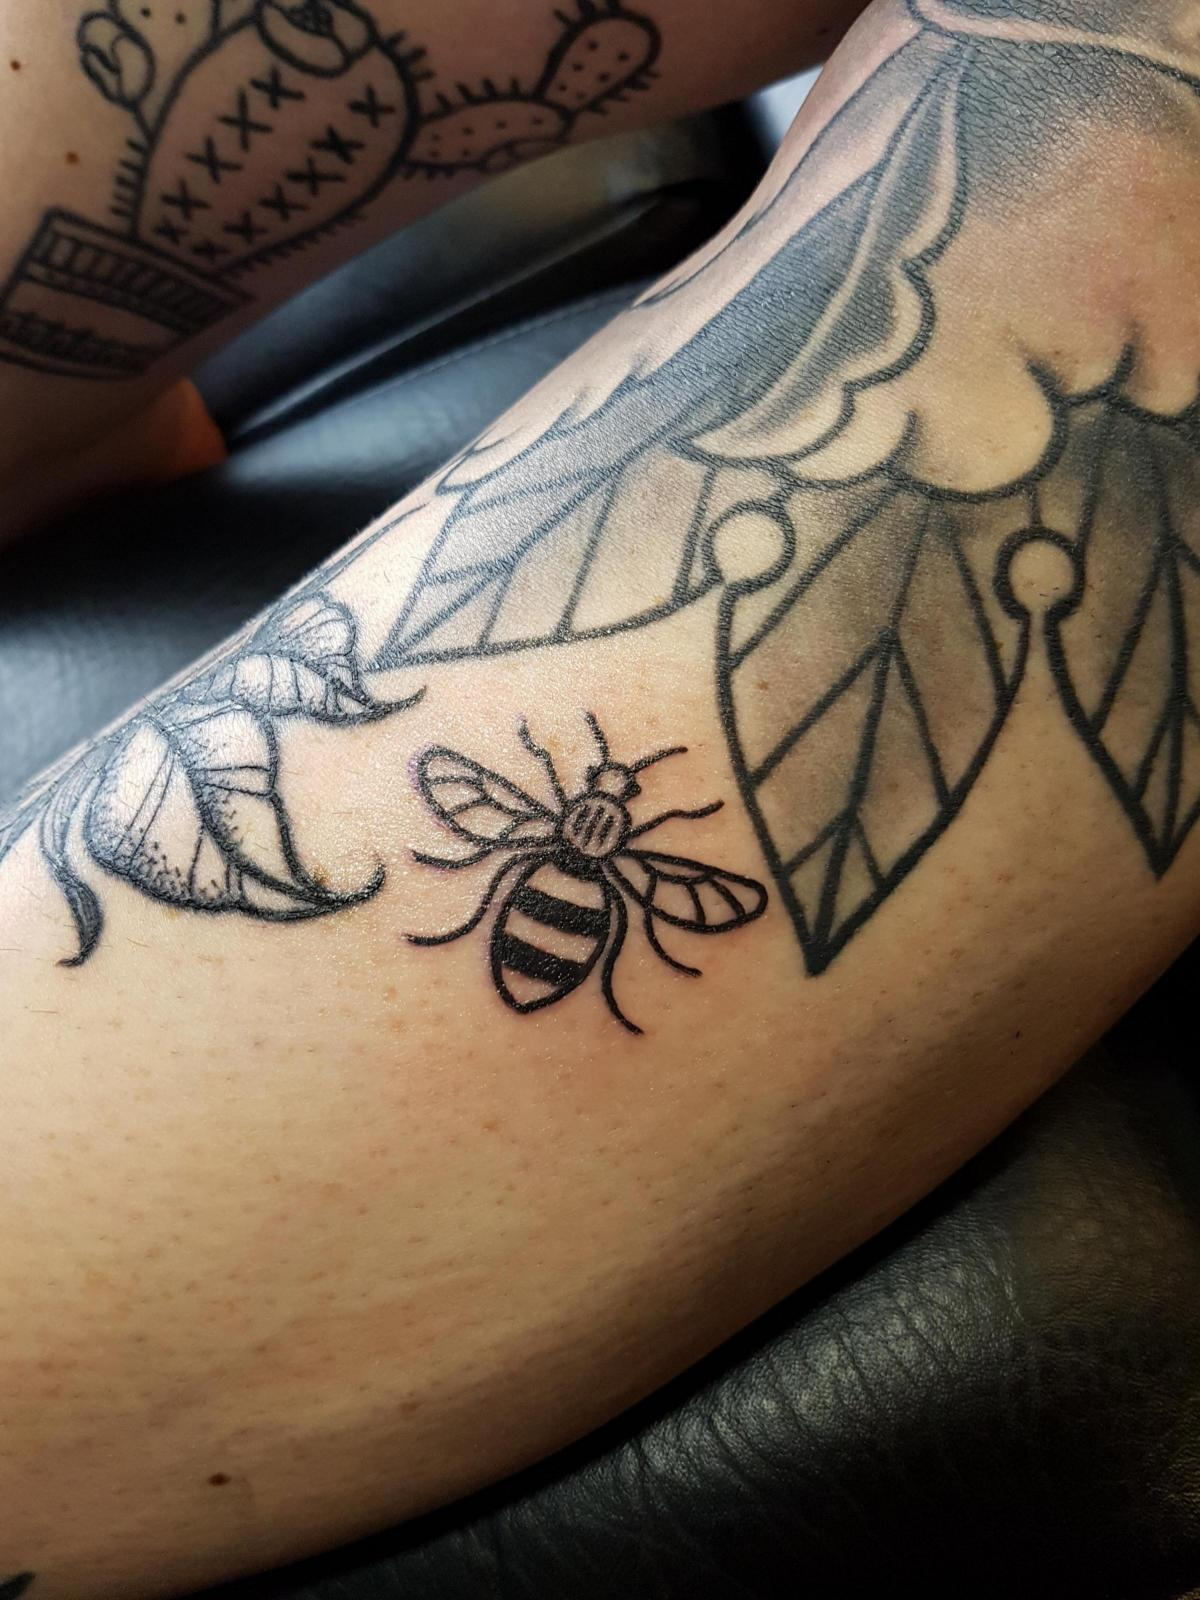 Tattoo studio inks dozens with bee symbol for manchester appeal tattoo studio inks dozens with bee symbol for manchester appeal biocorpaavc Gallery